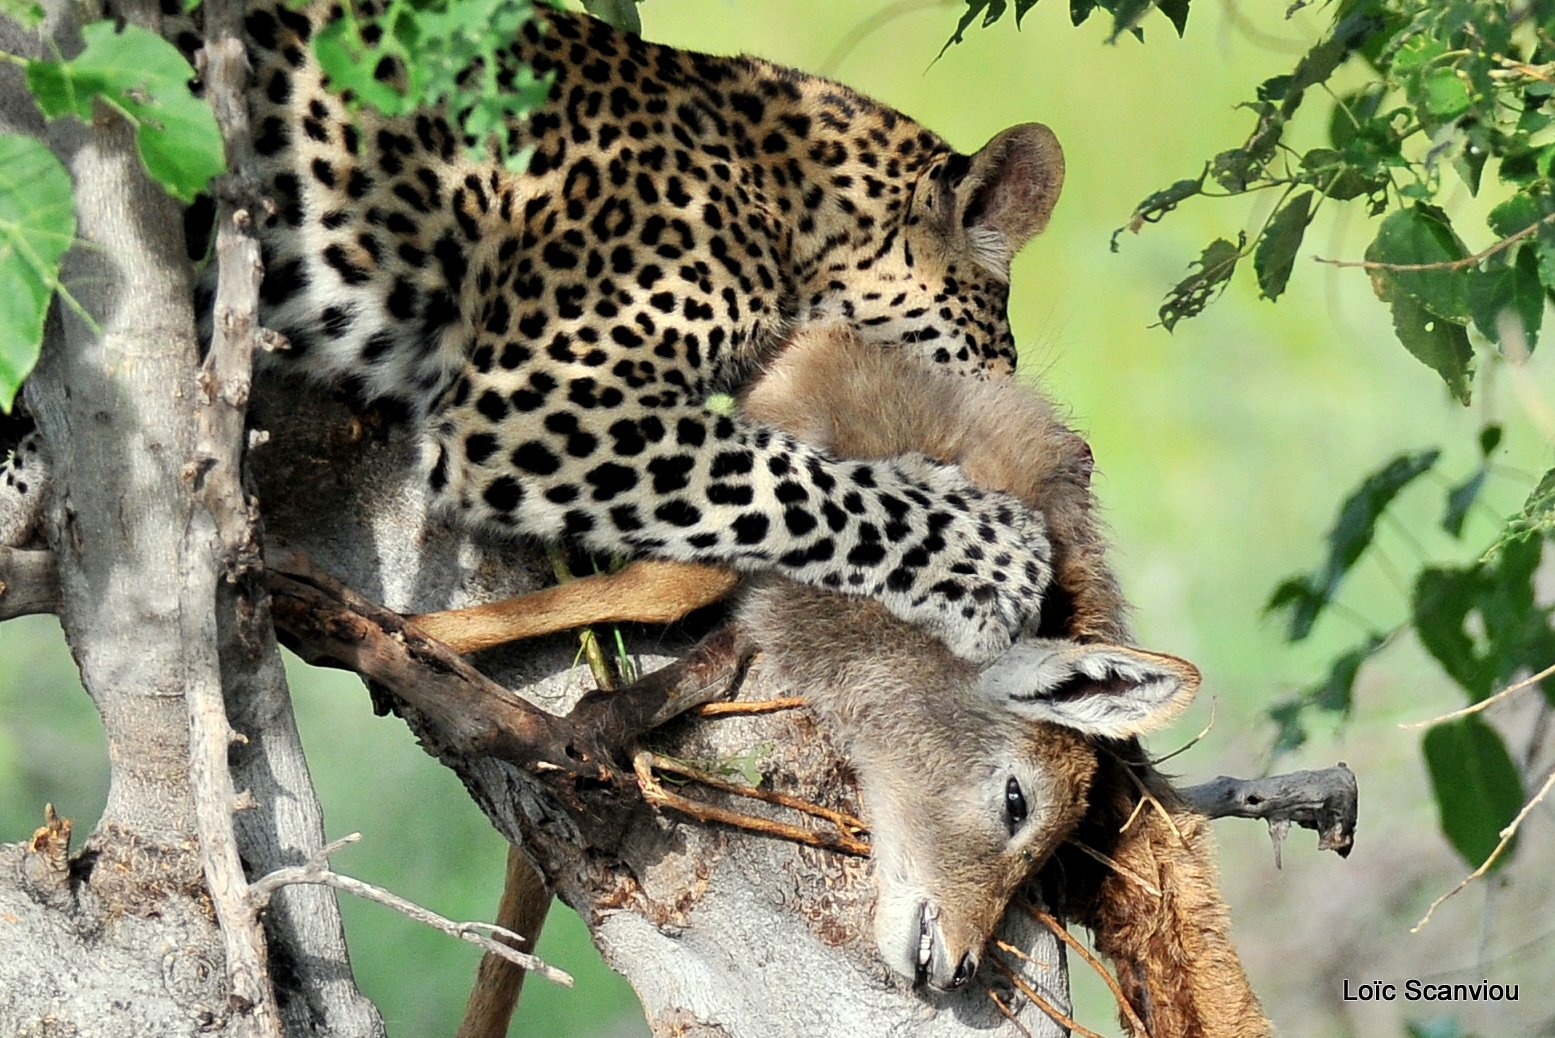 Léopard qui mange/Leopard eating (6)